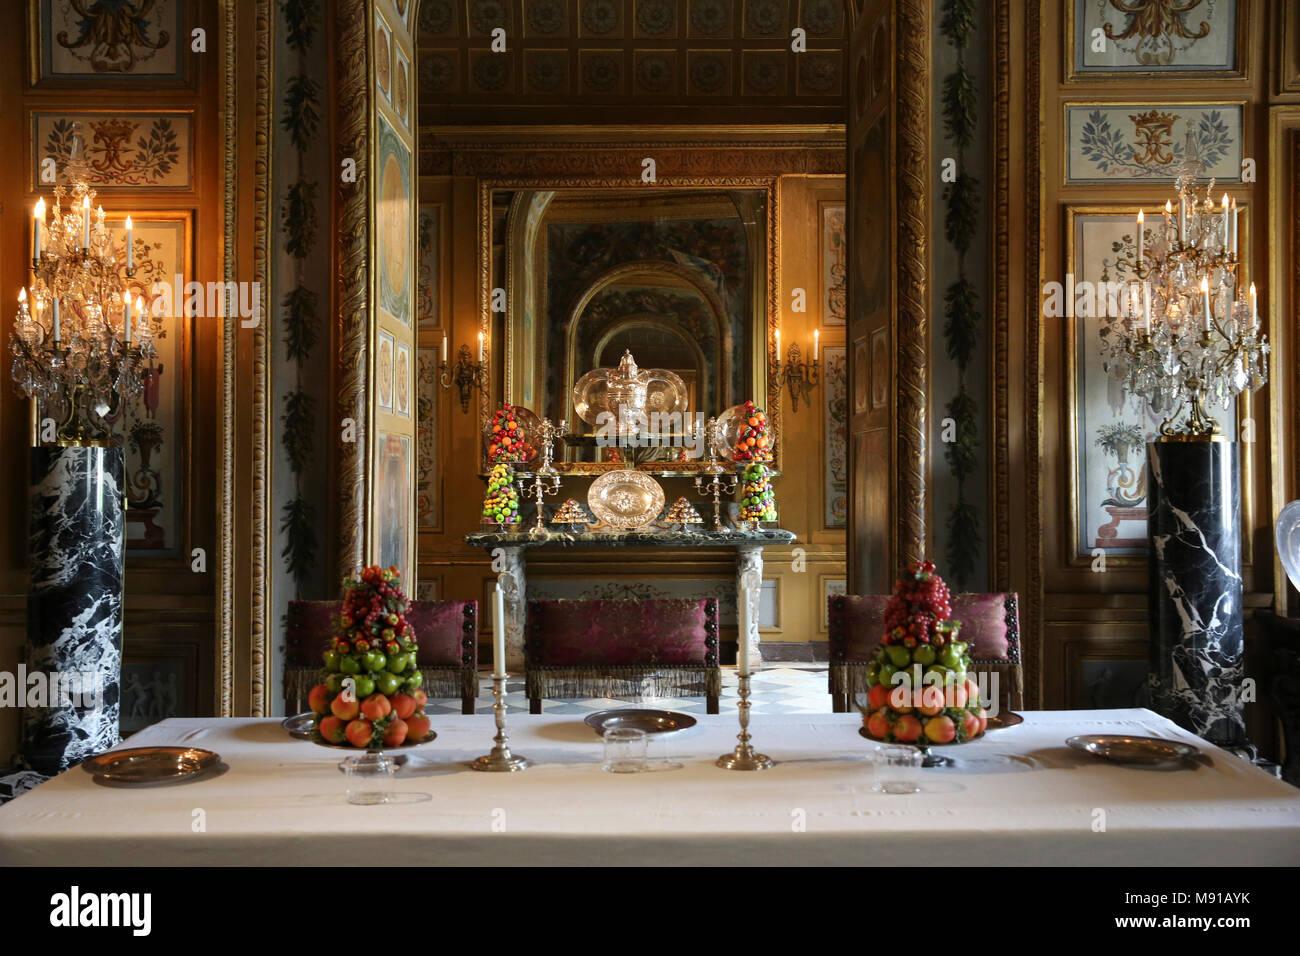 Vaux-le-vicomte castle. Dining room. France. - Stock Image